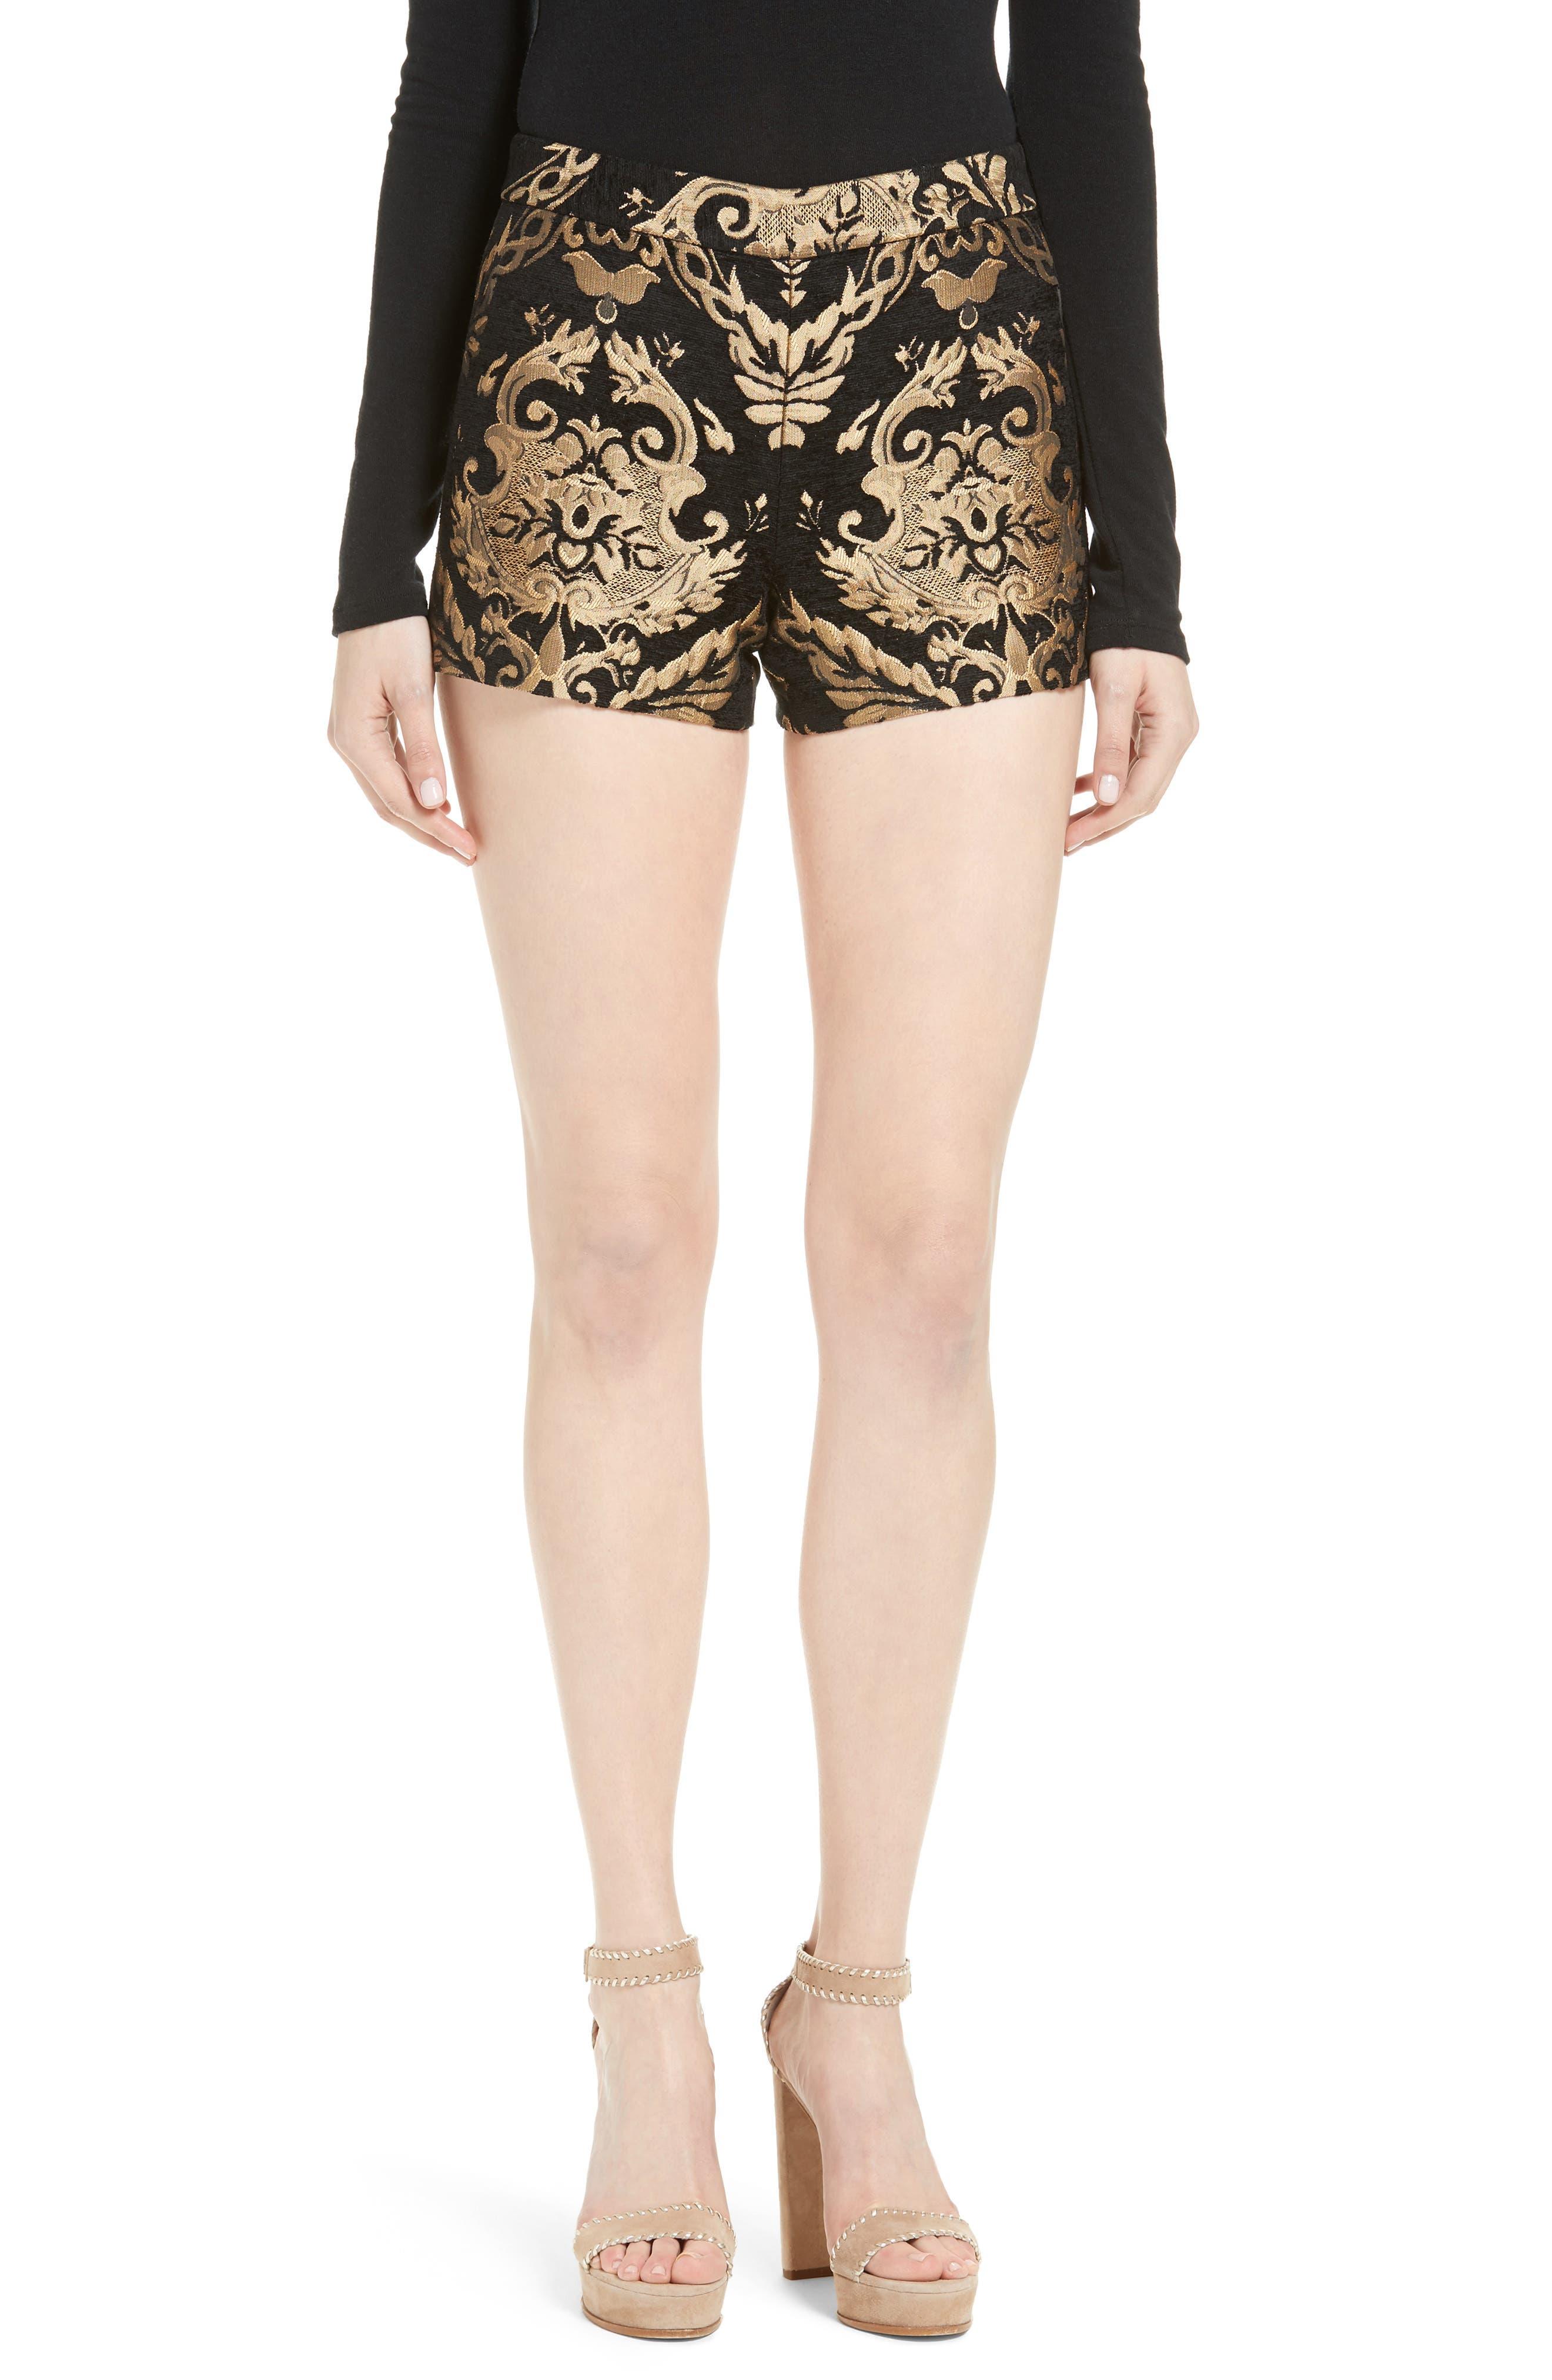 ALICE + OLIVIA Marisa Brocade Shorts, Main, color, 001